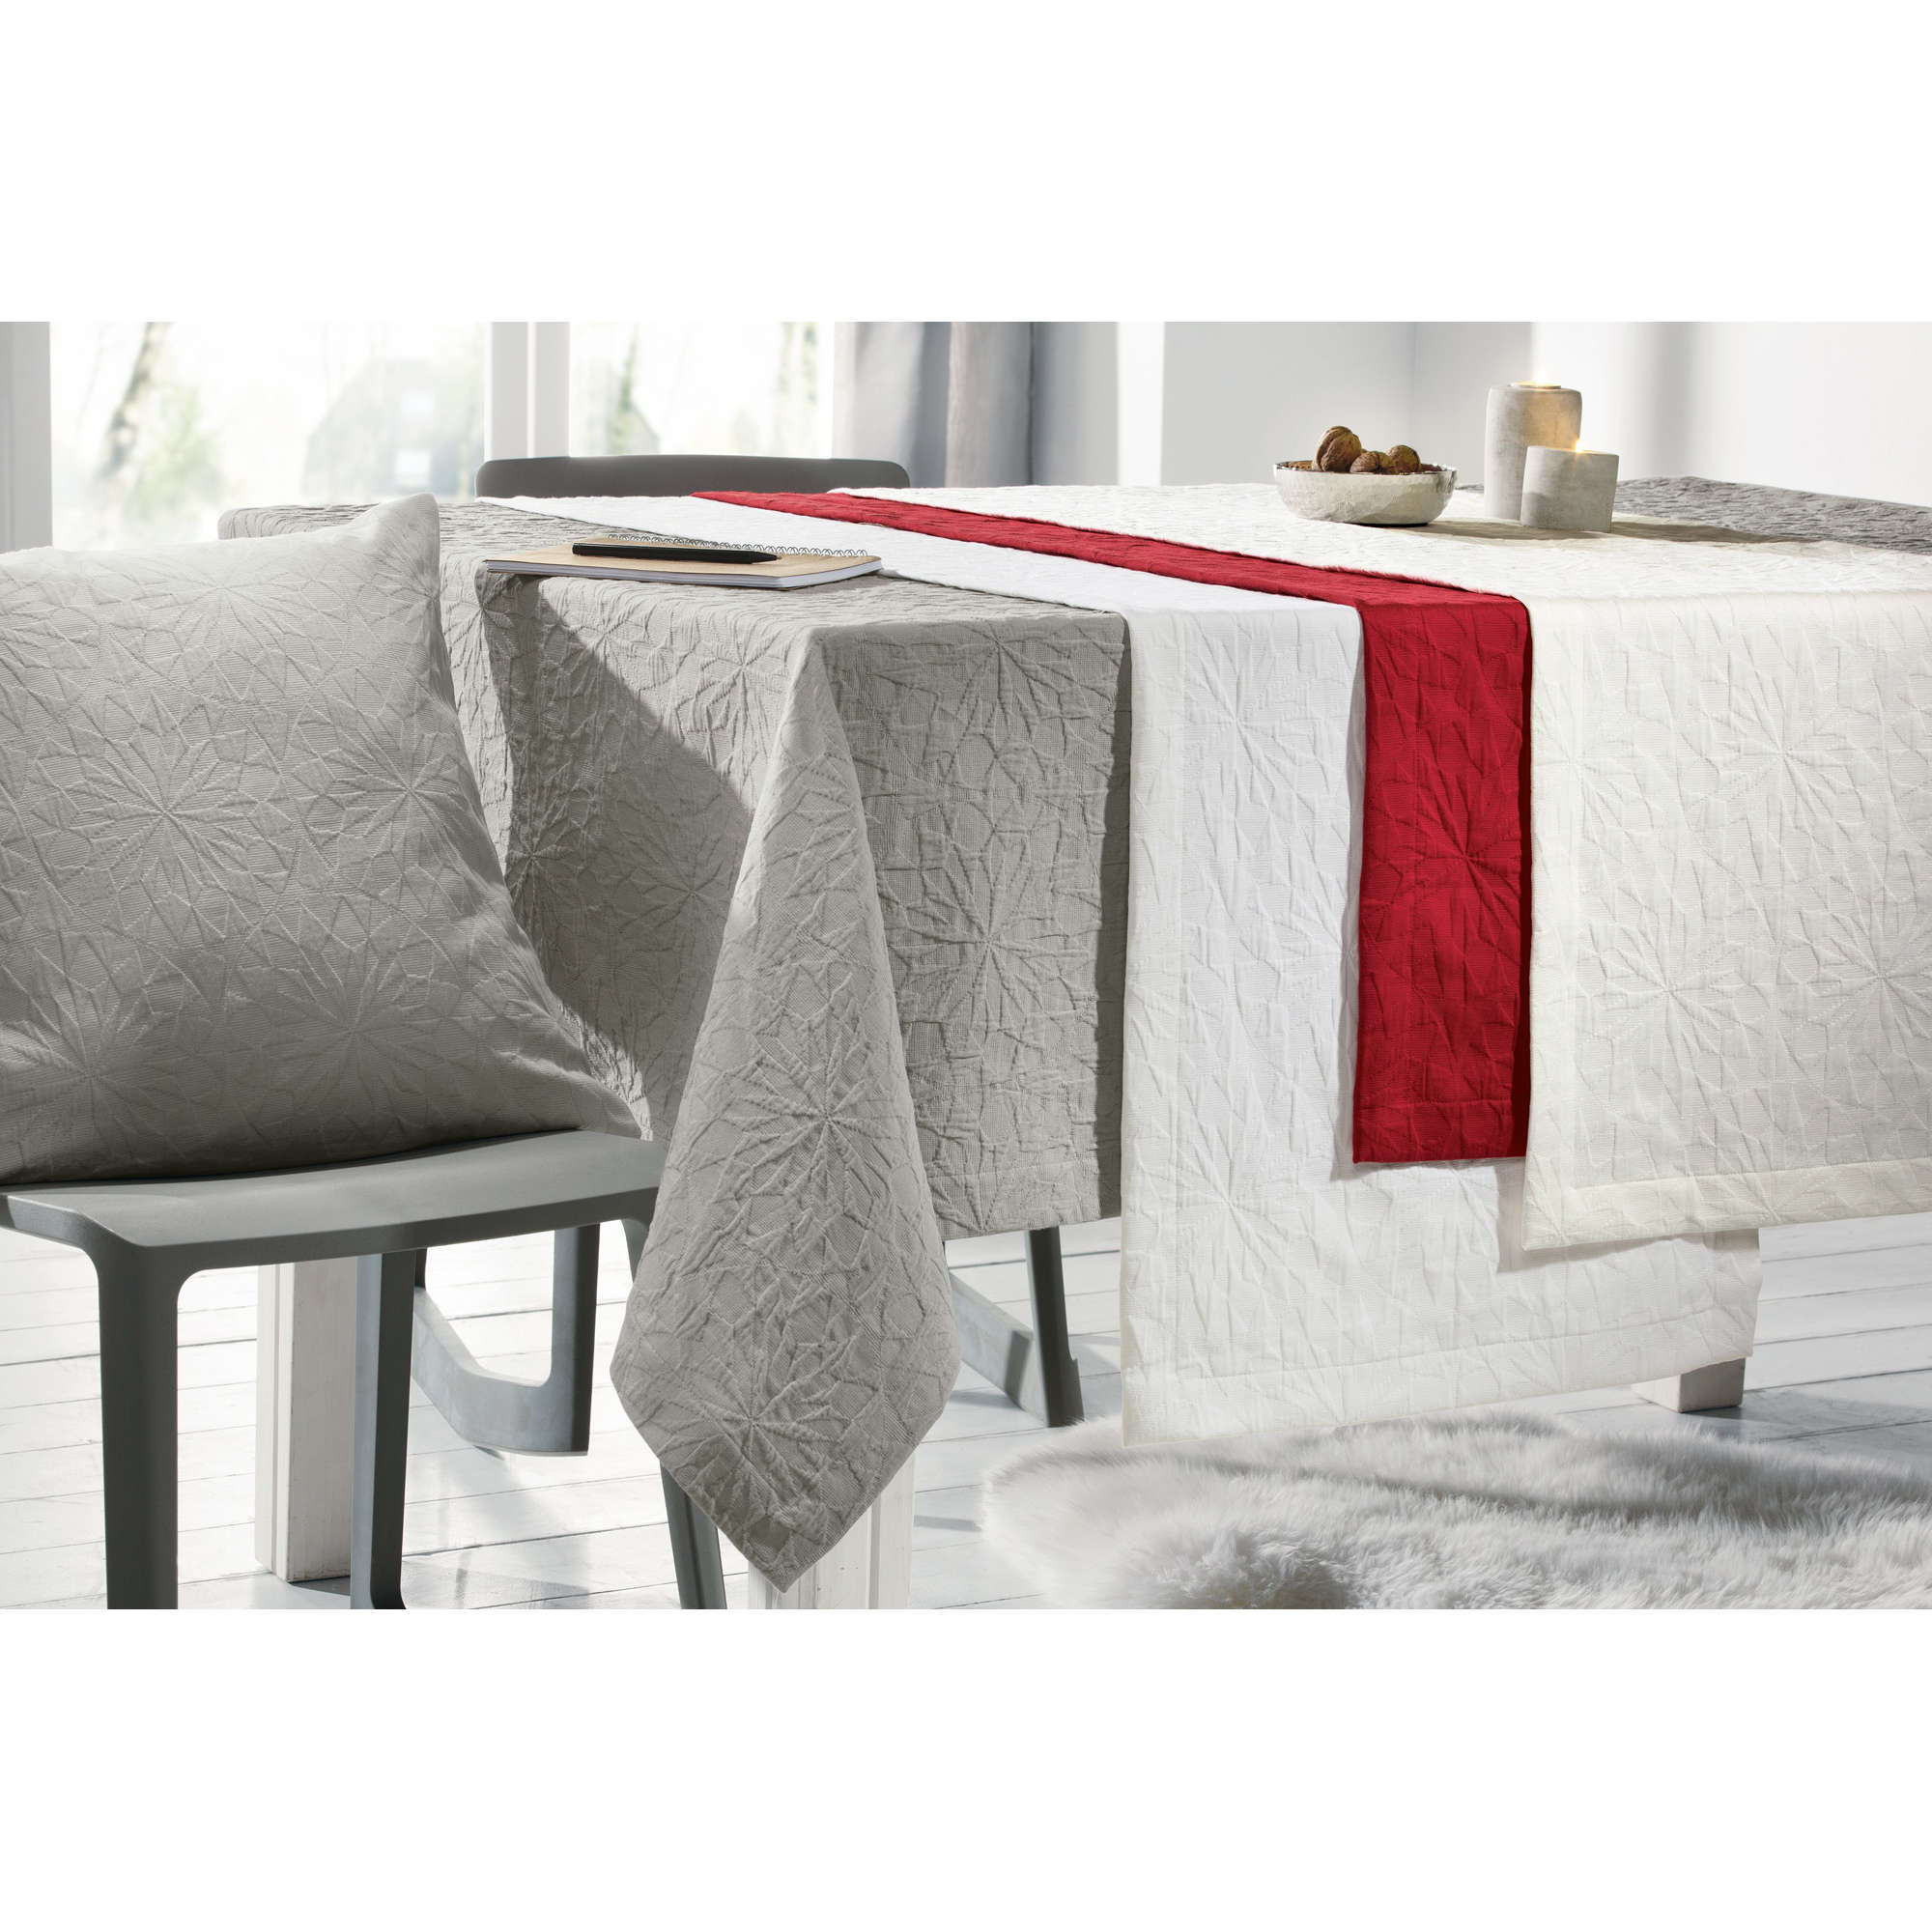 pichler tischdecke anna damast jacquard ebay. Black Bedroom Furniture Sets. Home Design Ideas